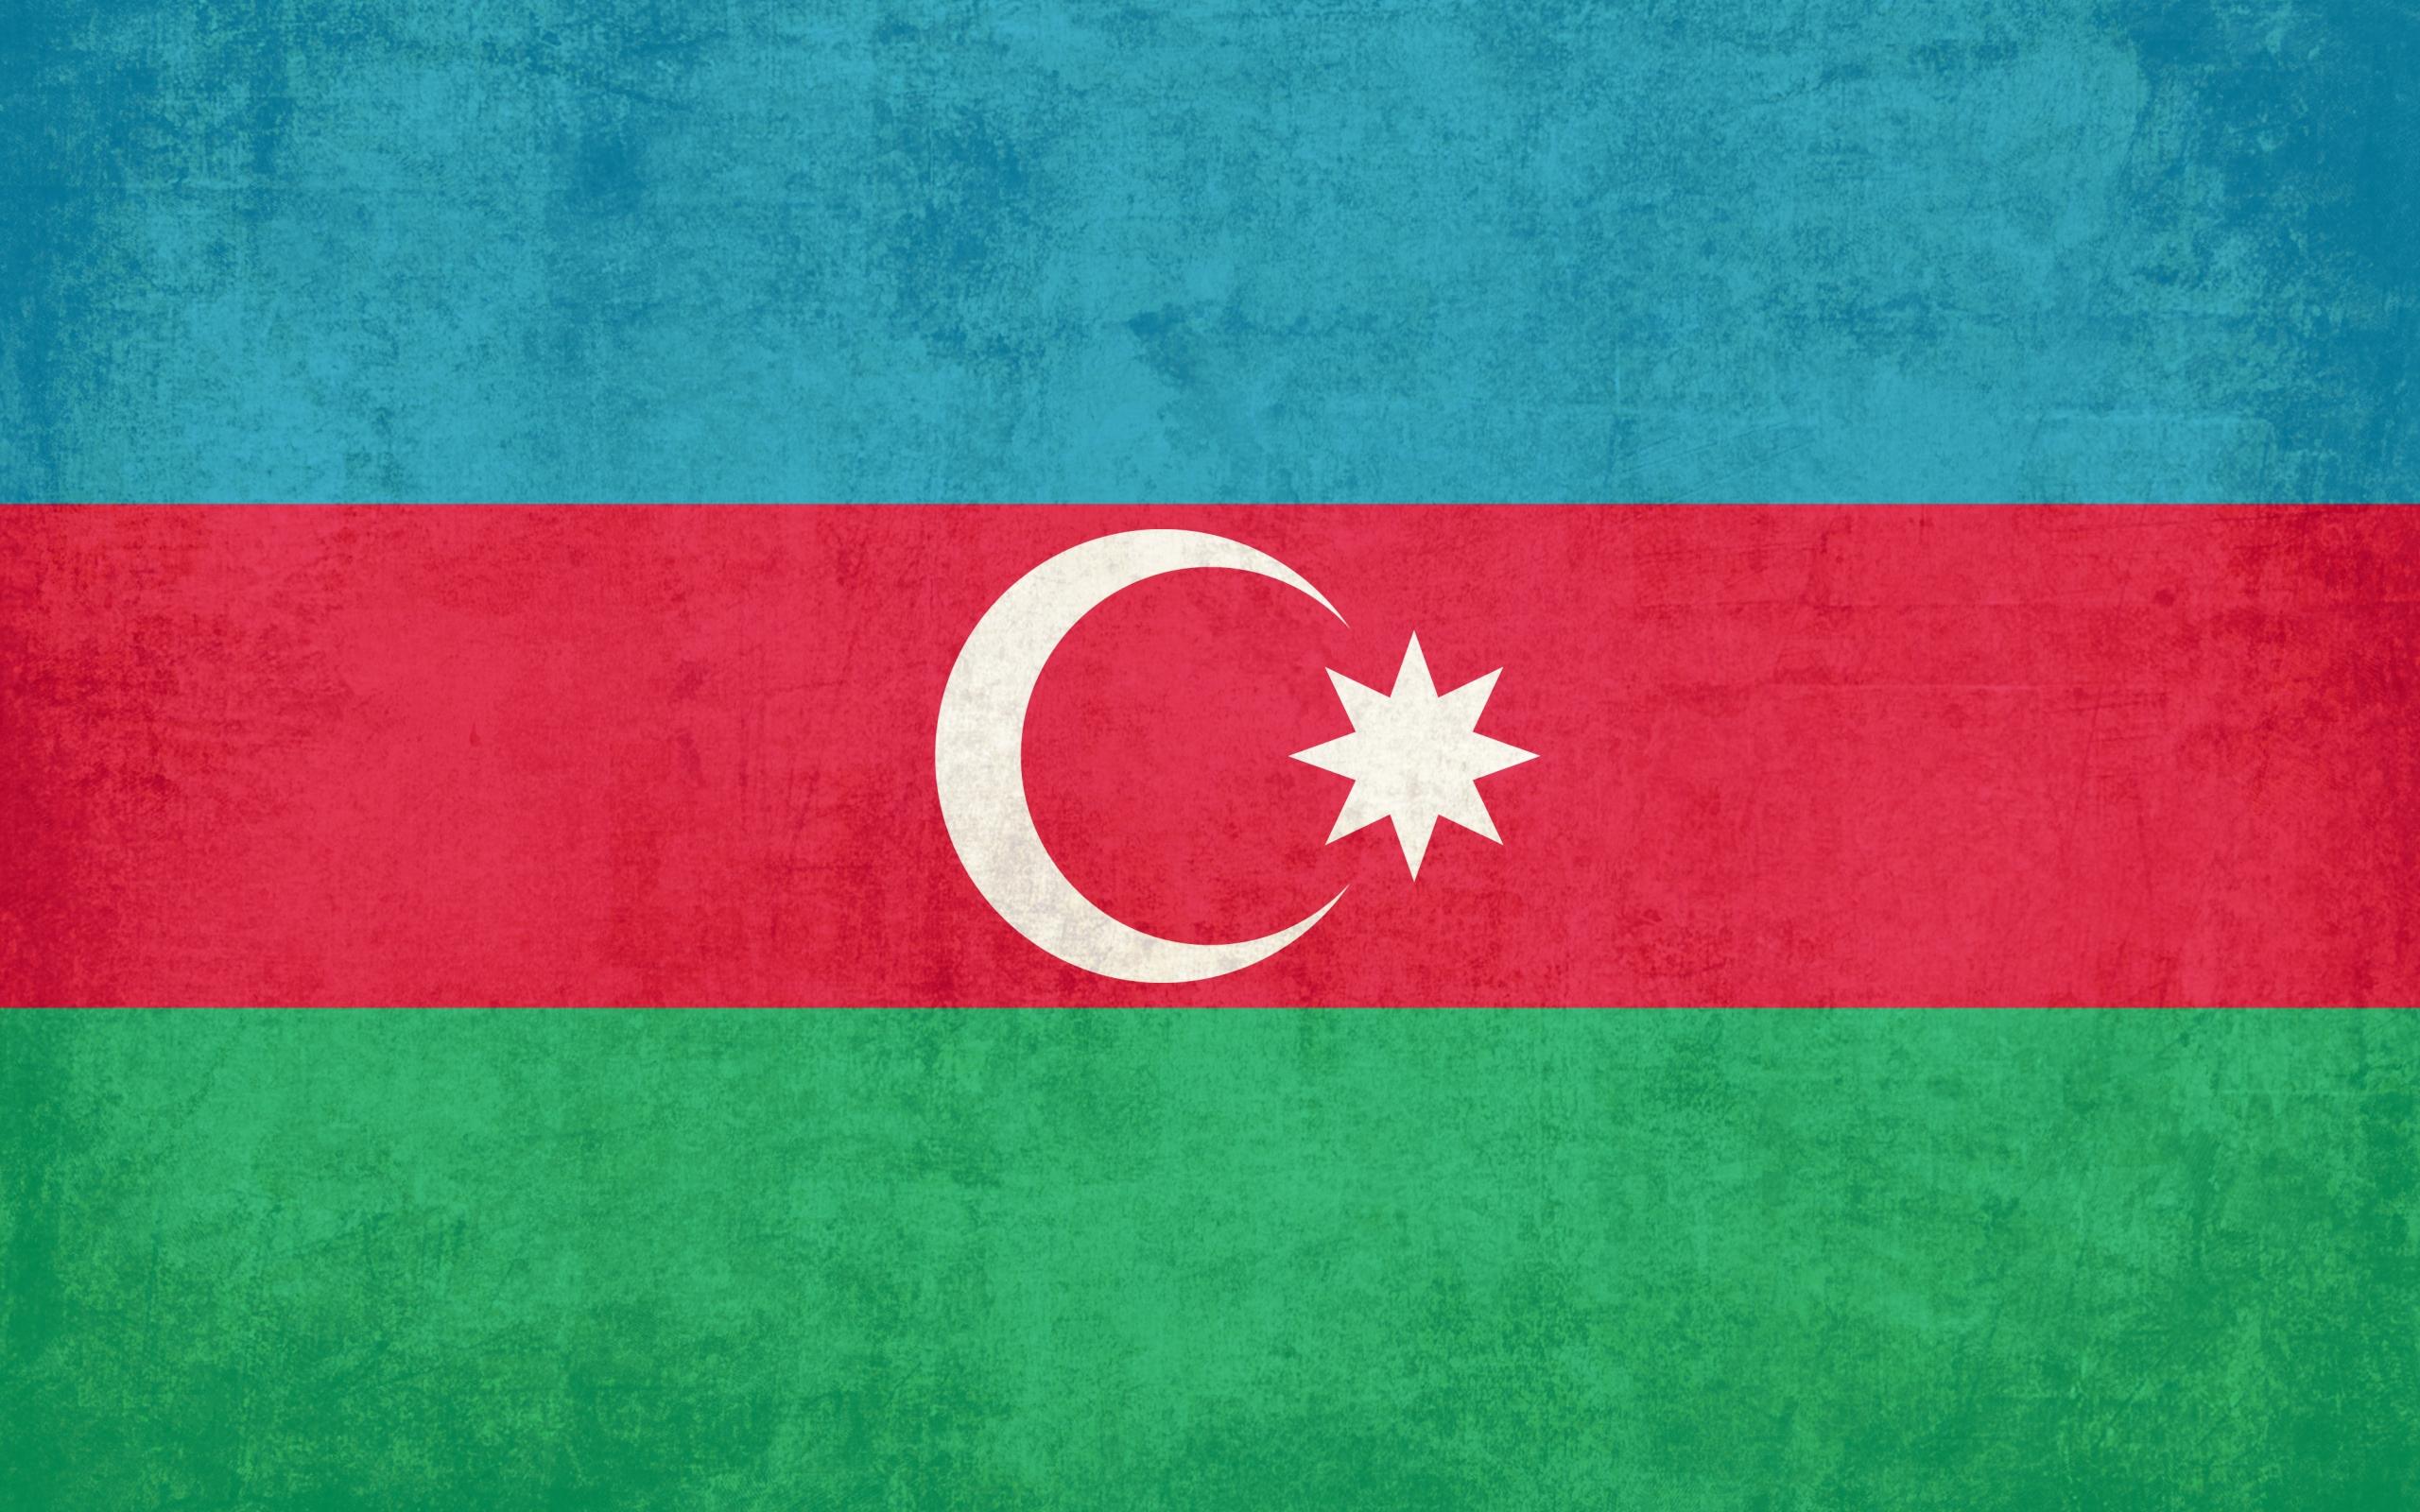 флаг азербайджана значение цветов